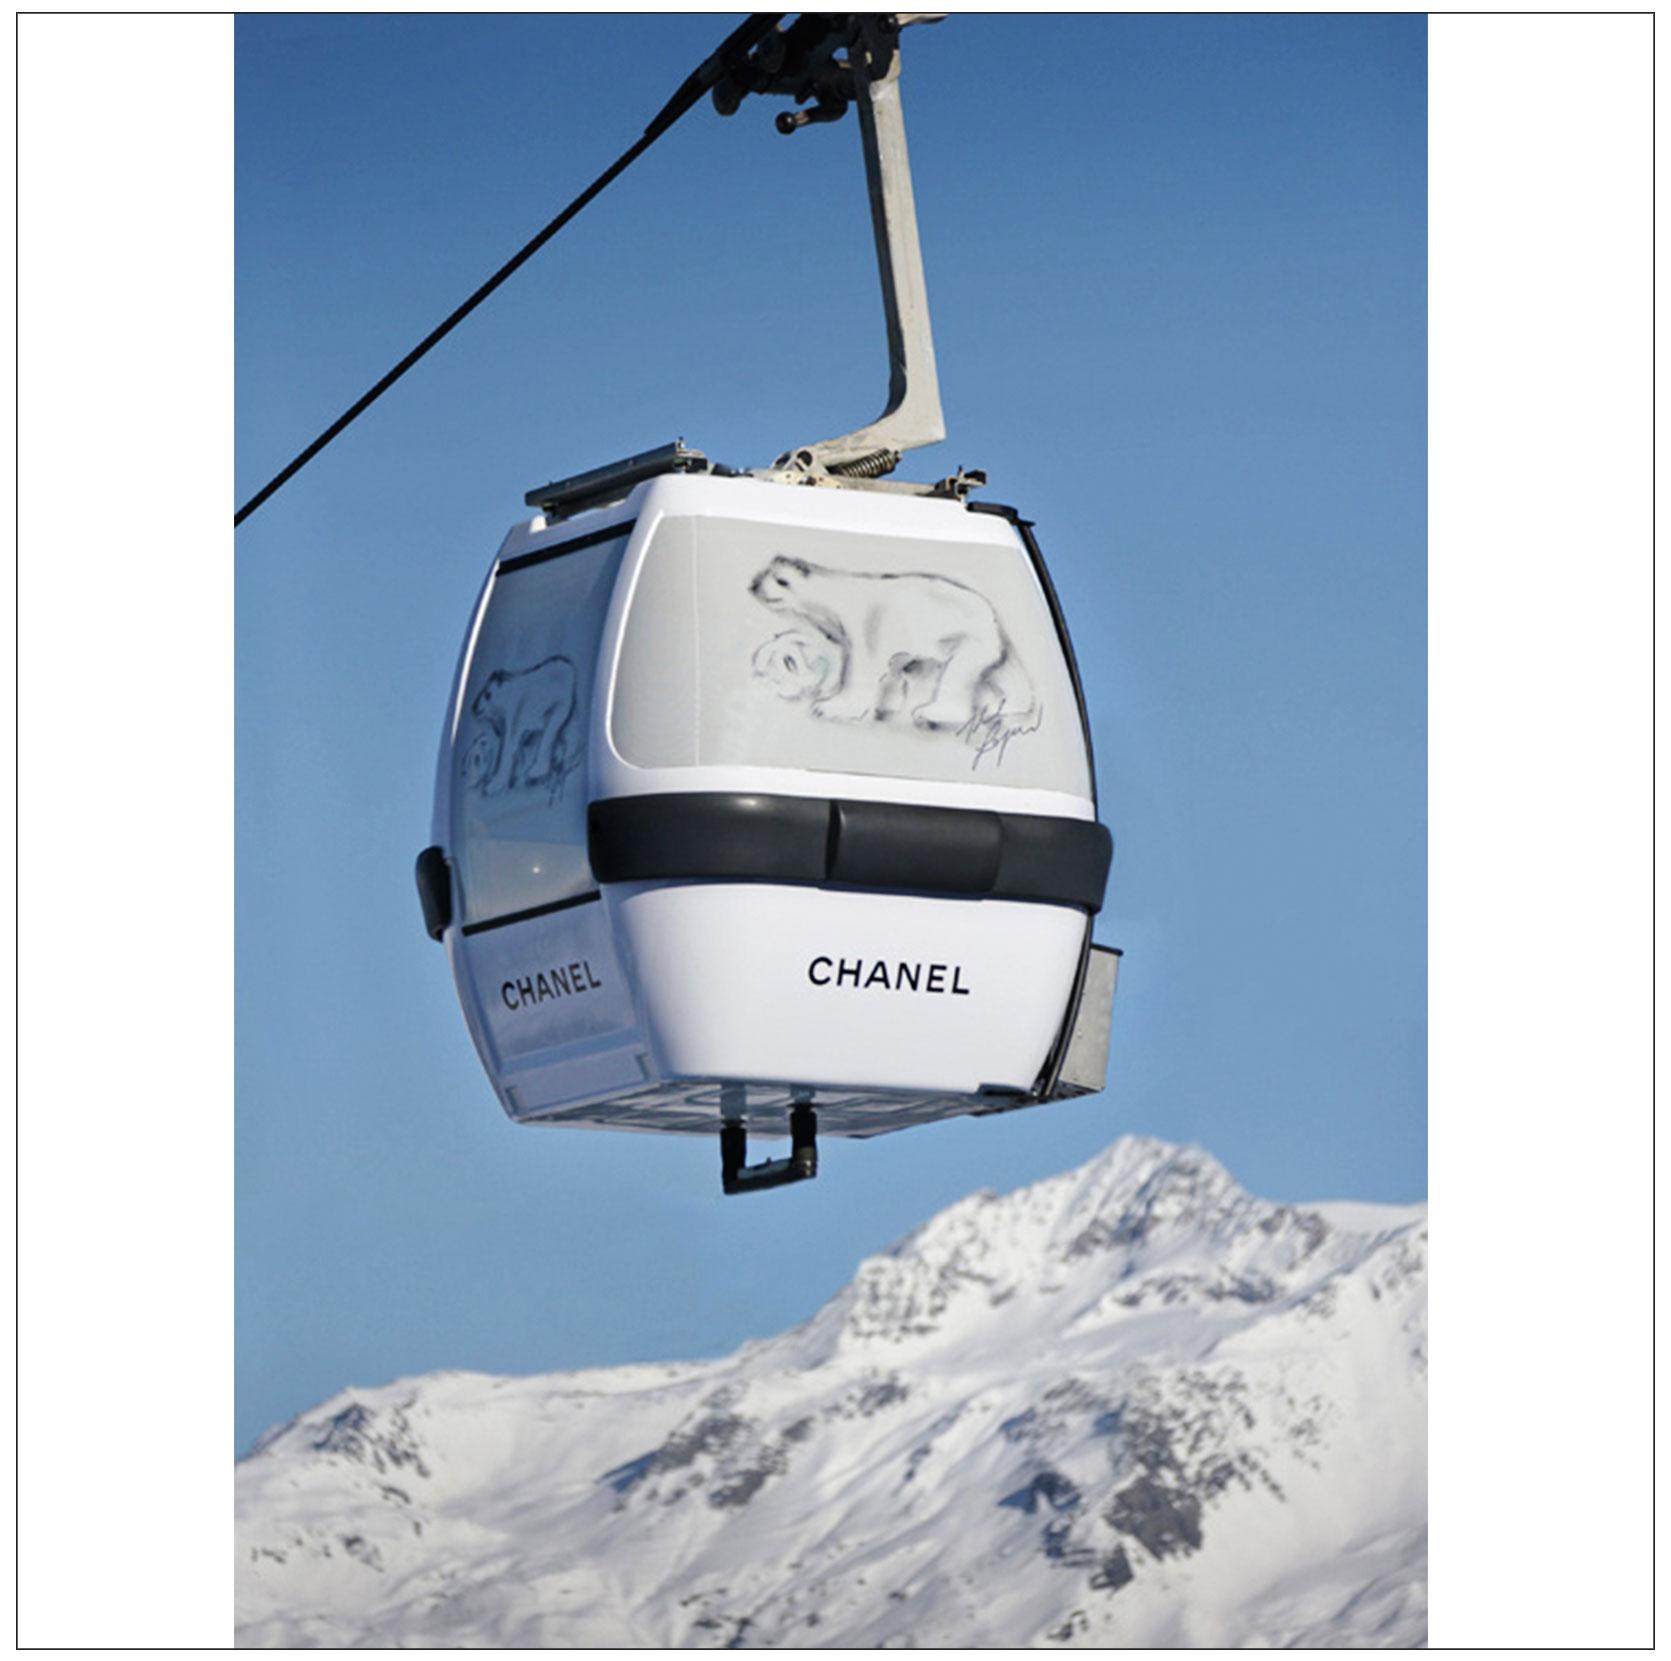 https://www.promotionmagazine.it/wp/wp-content/uploads/2013/12/Chanel-Courchevel.jpg